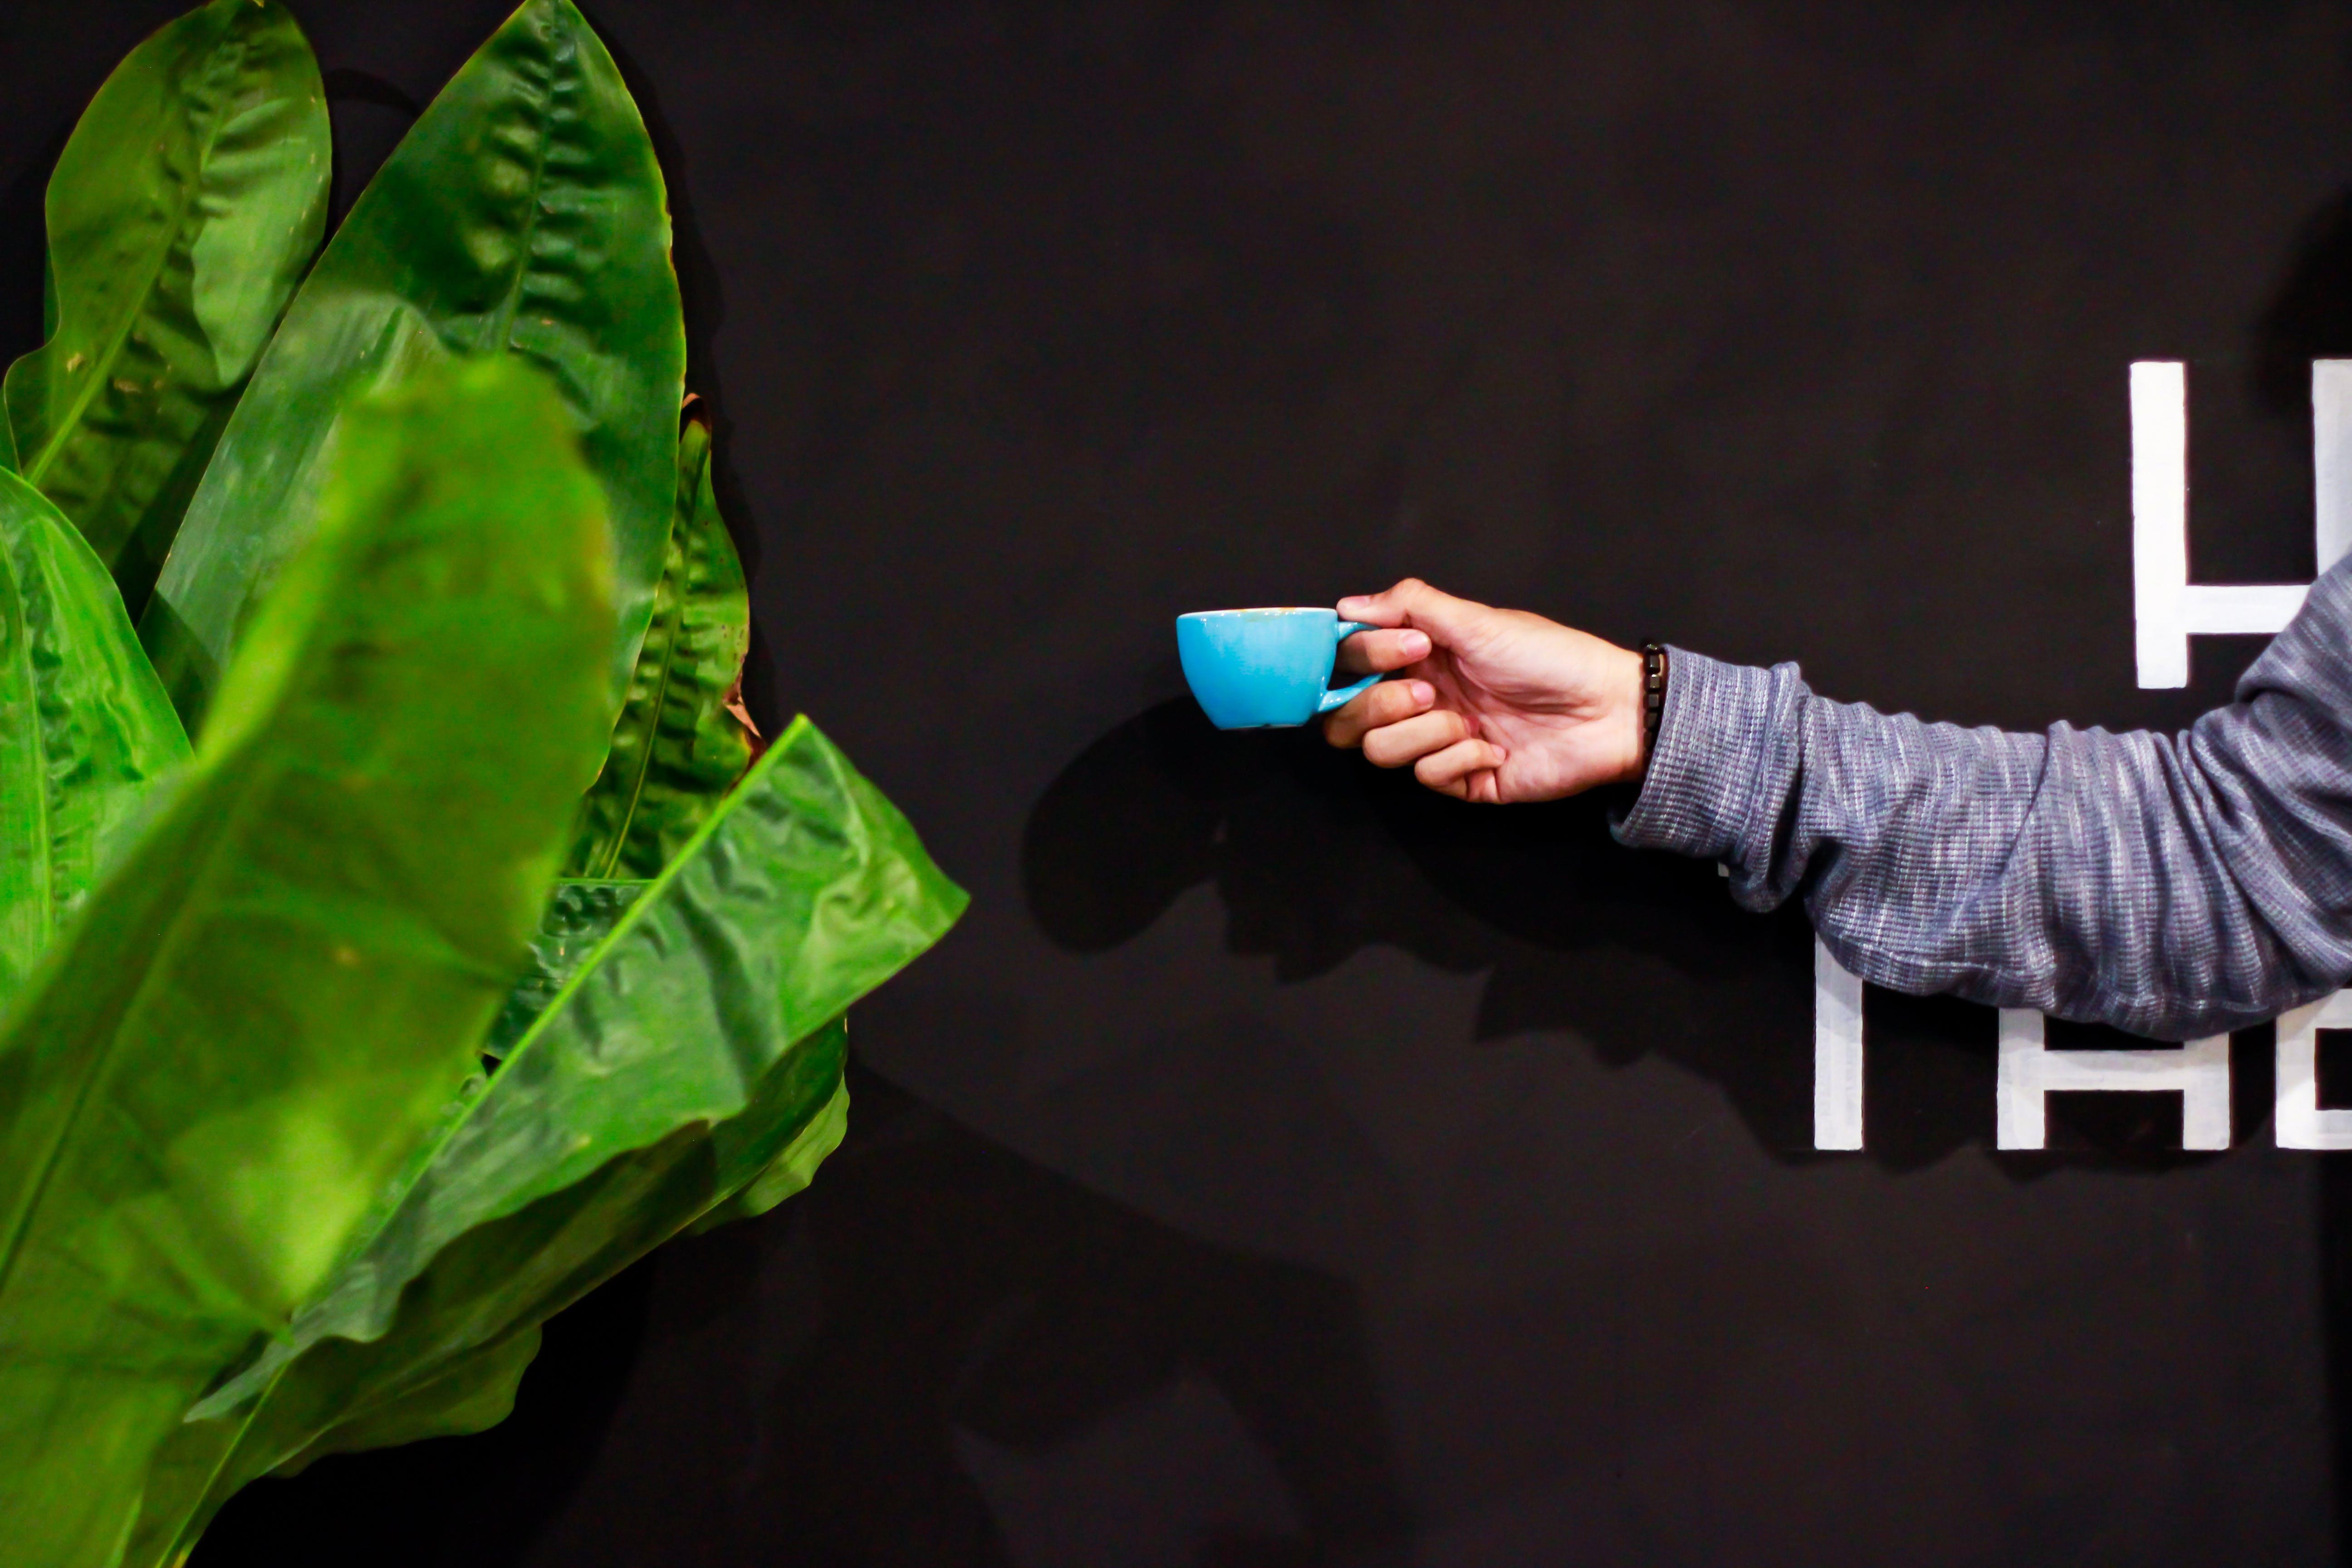 Free stock photo of hand, leaf, shadow, coffee mug